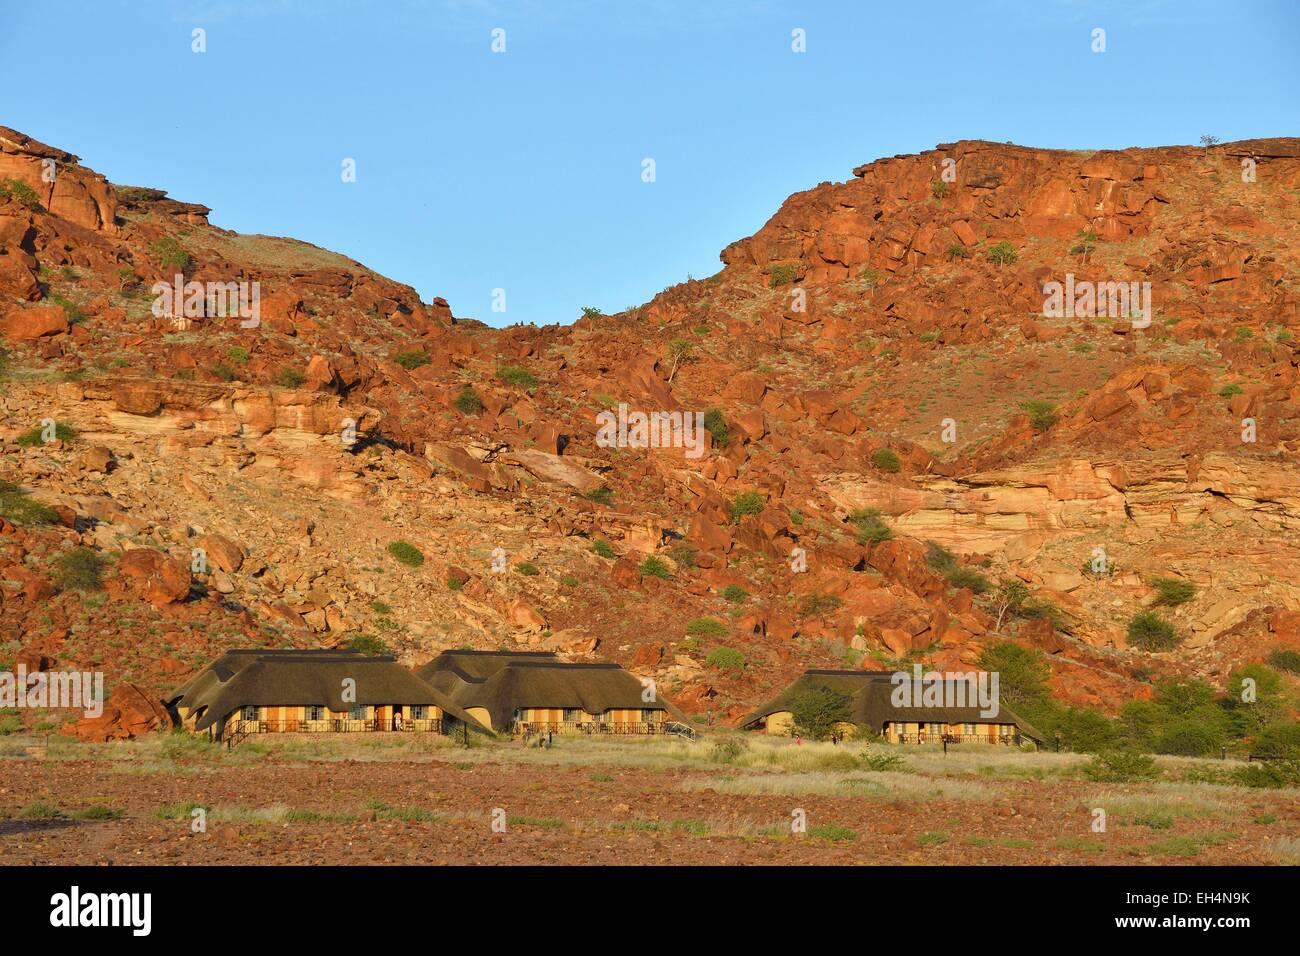 Namibia, Damaraland, Twyfeltontein, Twylfelfontein Lodge - Stock Image